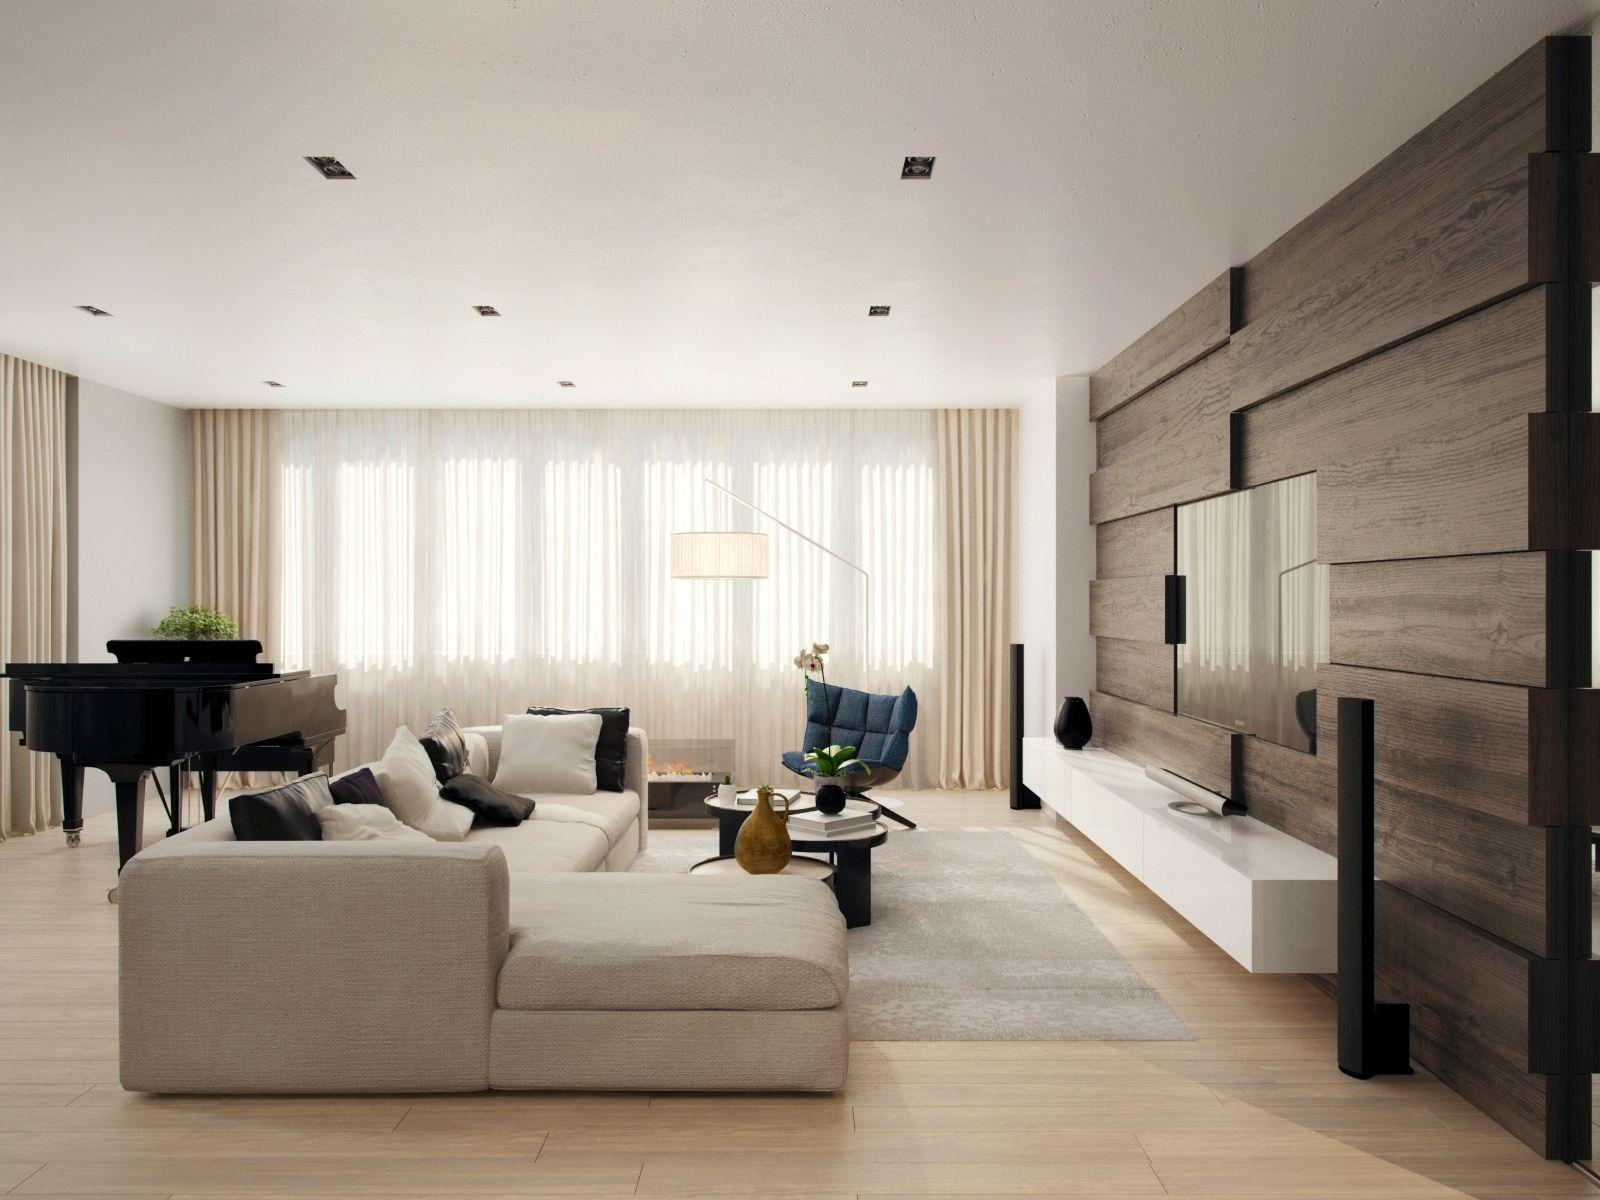 apartment-for-musician by Alexandra Fedorova | home ideas ...